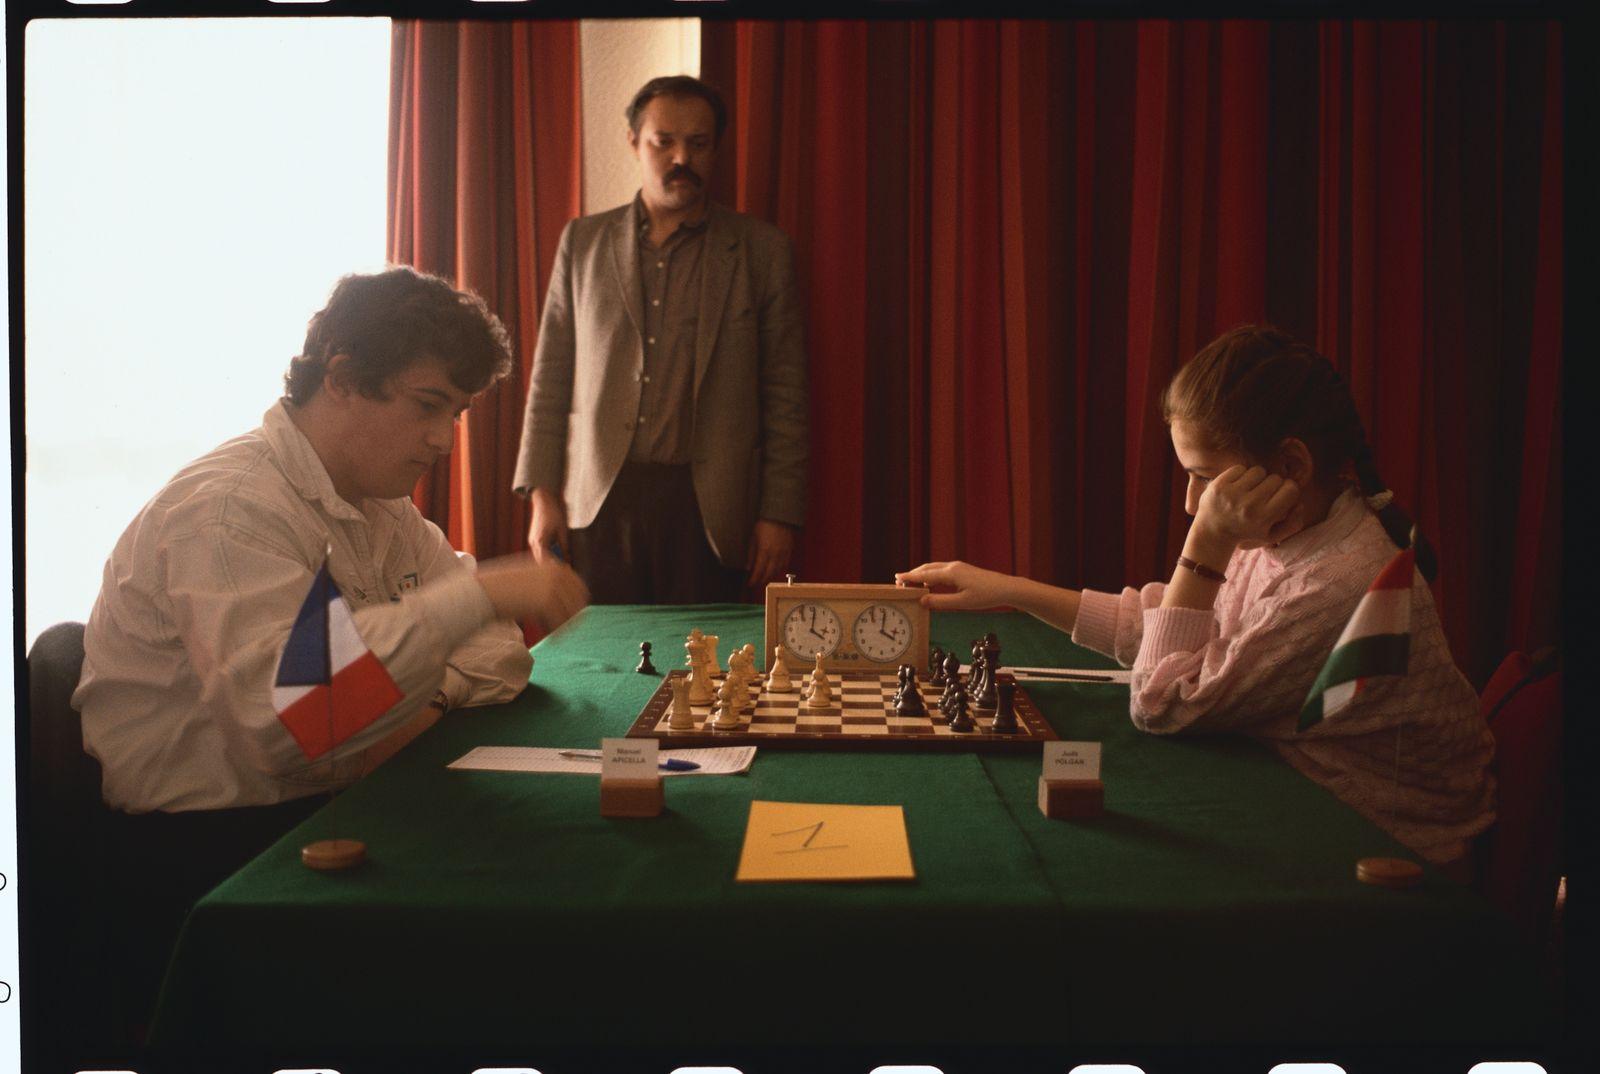 Chess Prodigy Judith Polgar